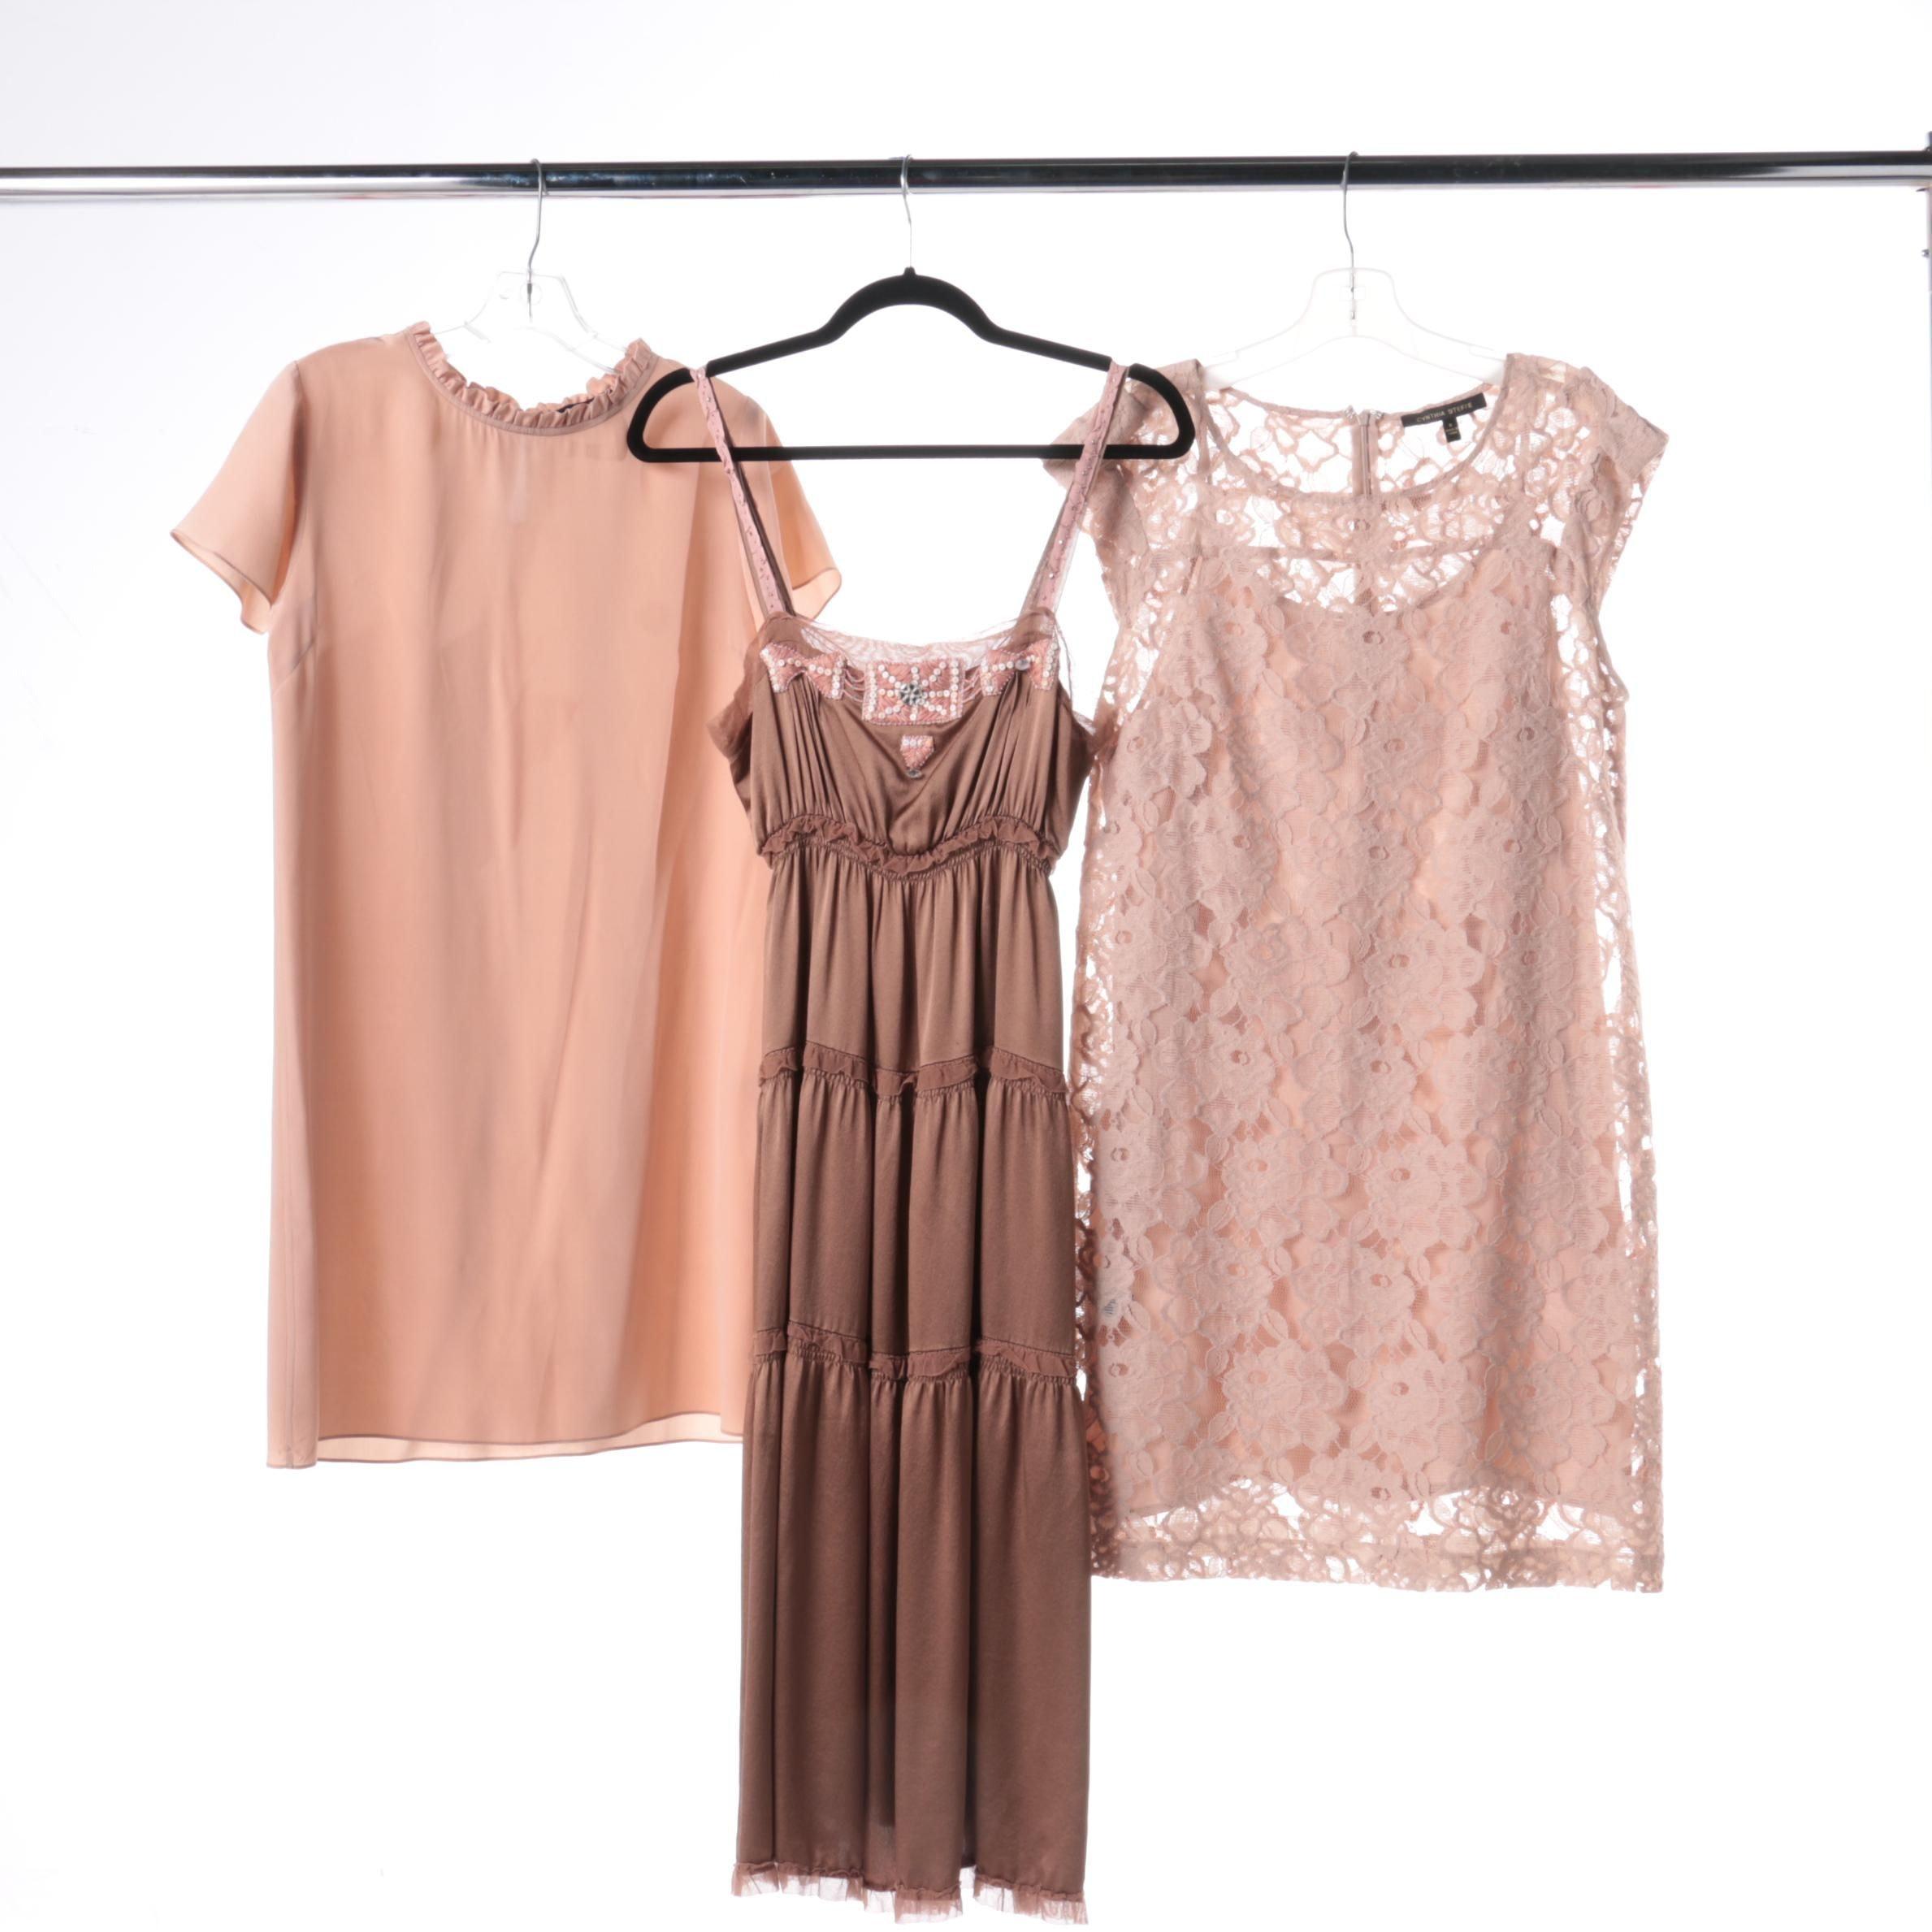 Blush Dresses Including Rebecca Taylor